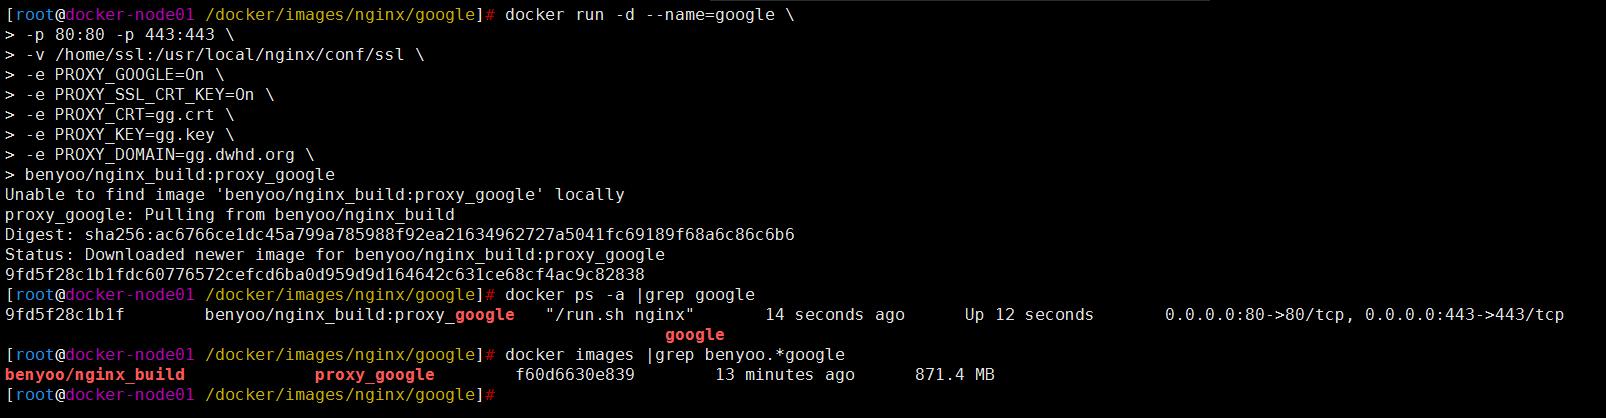 Docker之构建Nginx镜像实现迅速搭建Google反代站点